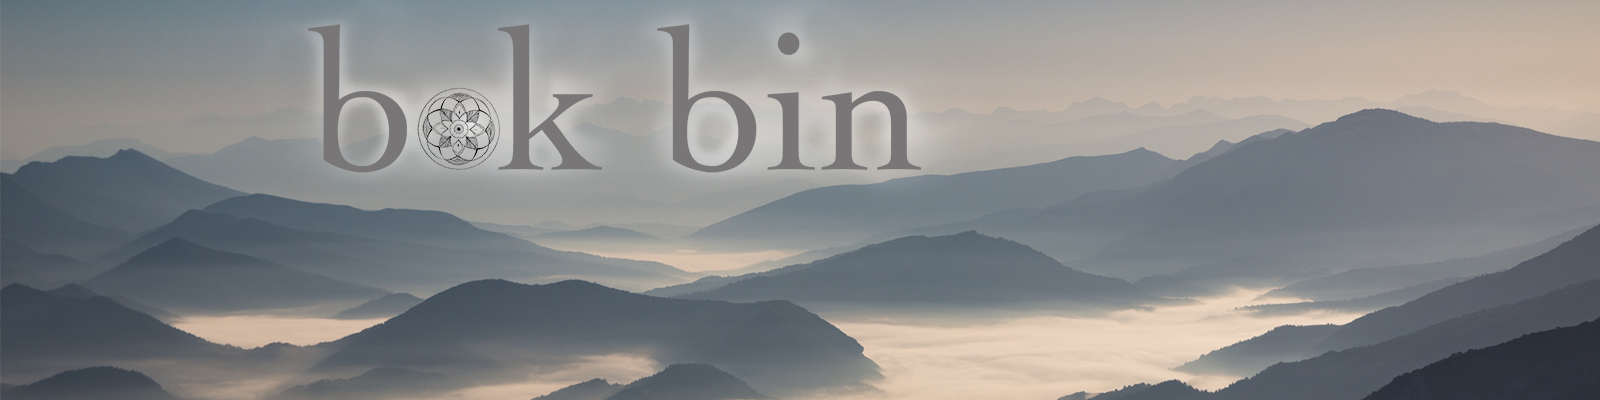 Bok Bin header montagnes